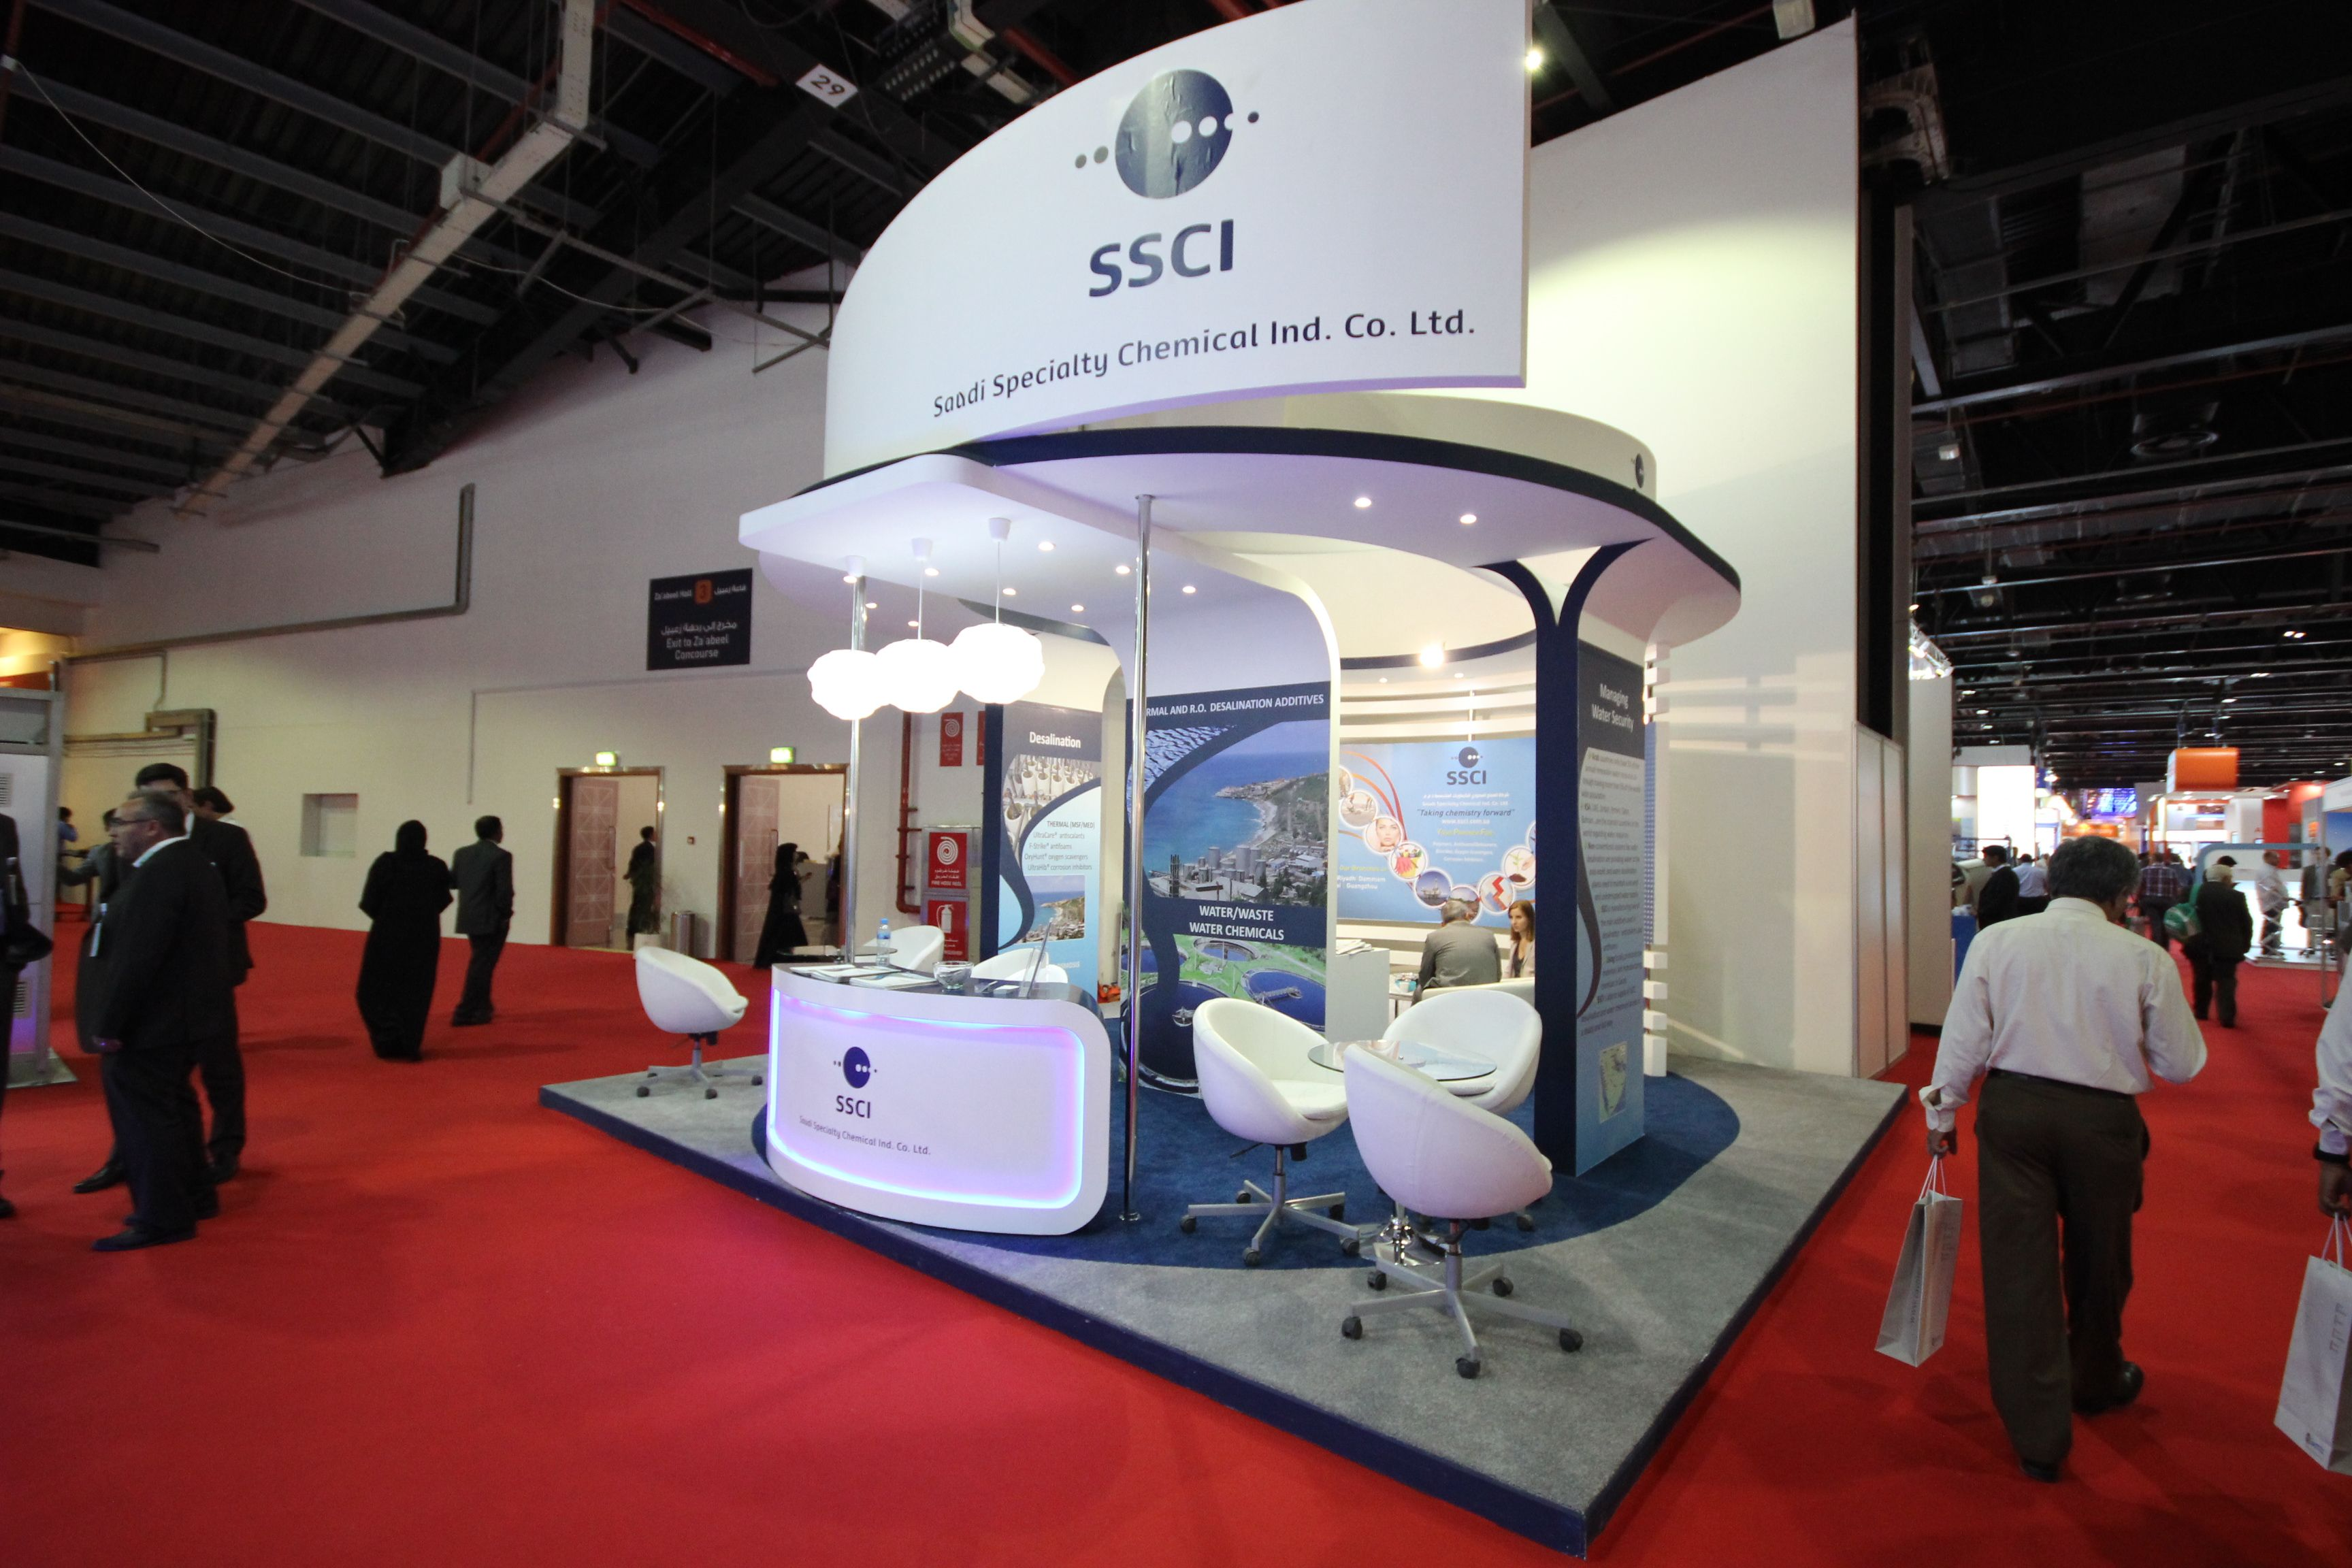 D Exhibition In Dubai : Ssci wetex mind spirit design dubai exhibition